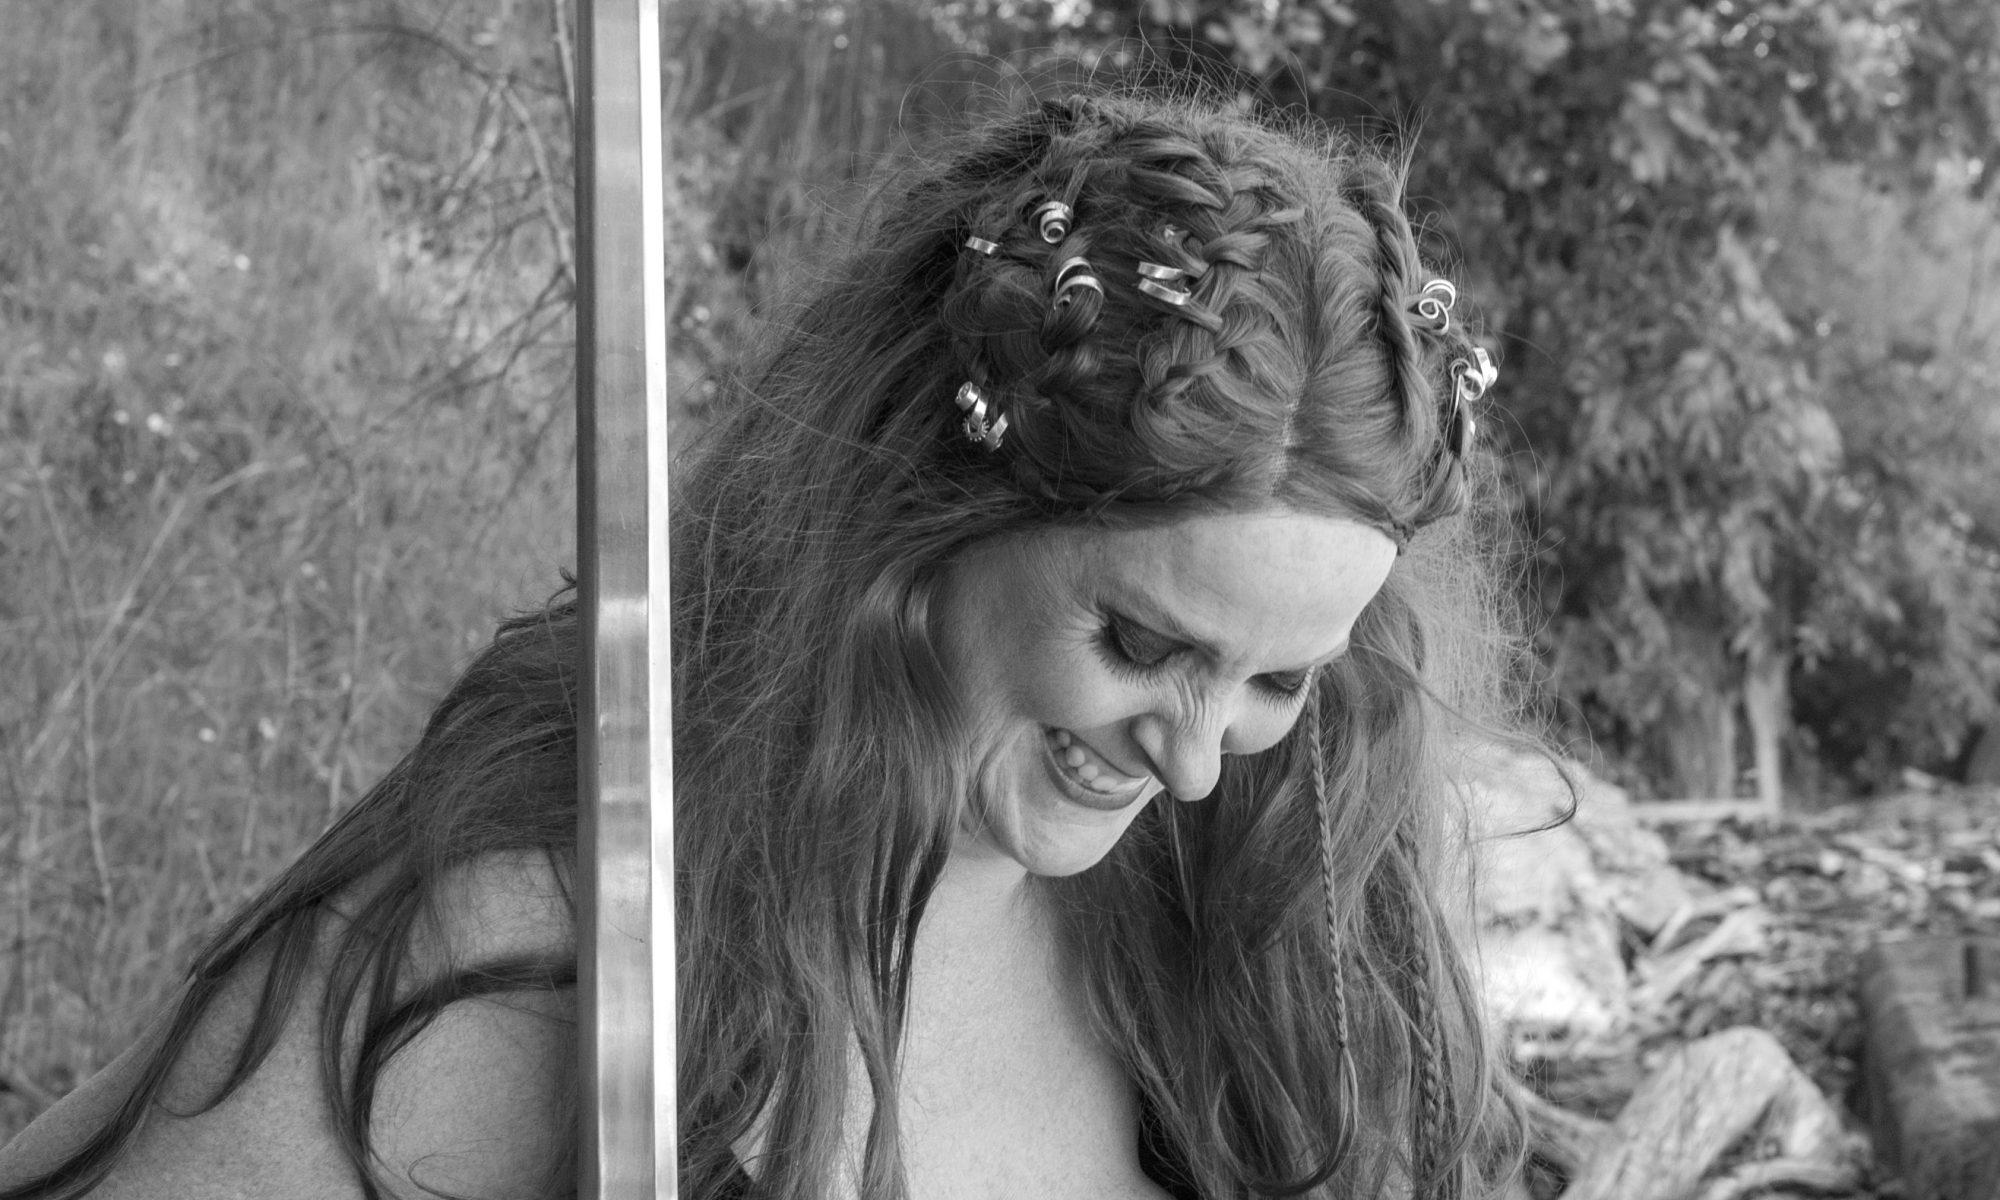 playwright notes, shield maiden, Viking warrior, Viking woman warrior, Shield Maiden play, play, theatre, strong women, historical women, viking warrior, viking warrior woman, black and white photography, stage still, Melanie Teichroeb